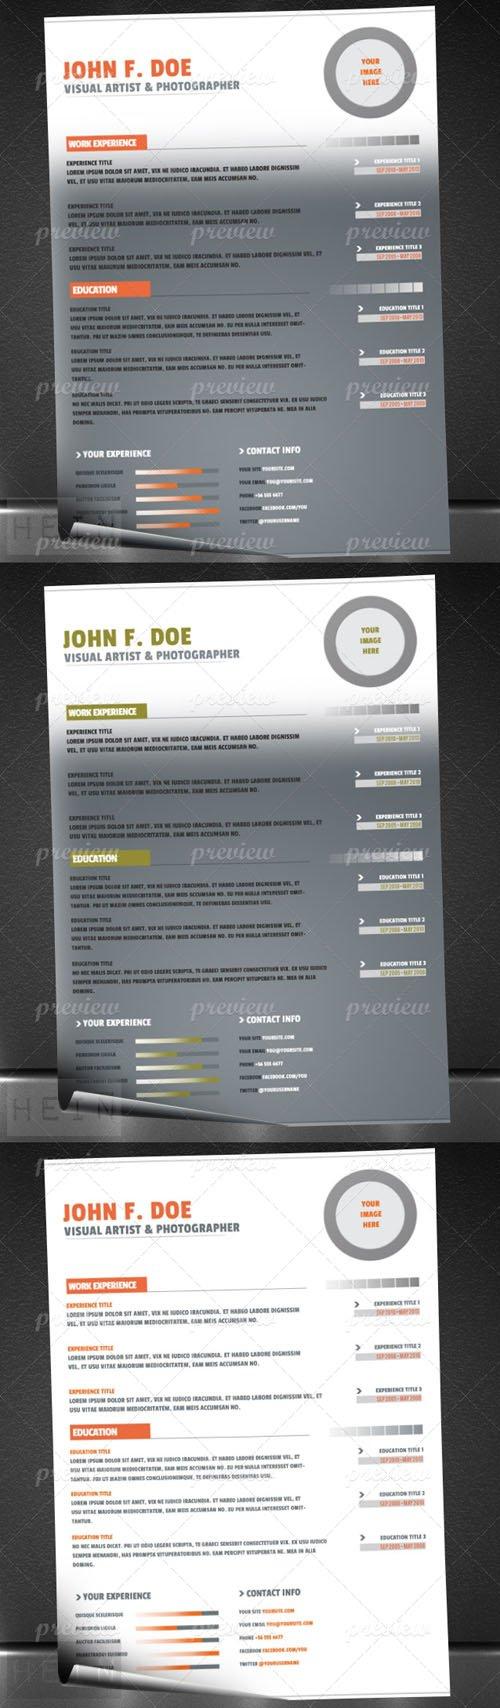 Minimal Resume or CV bundle